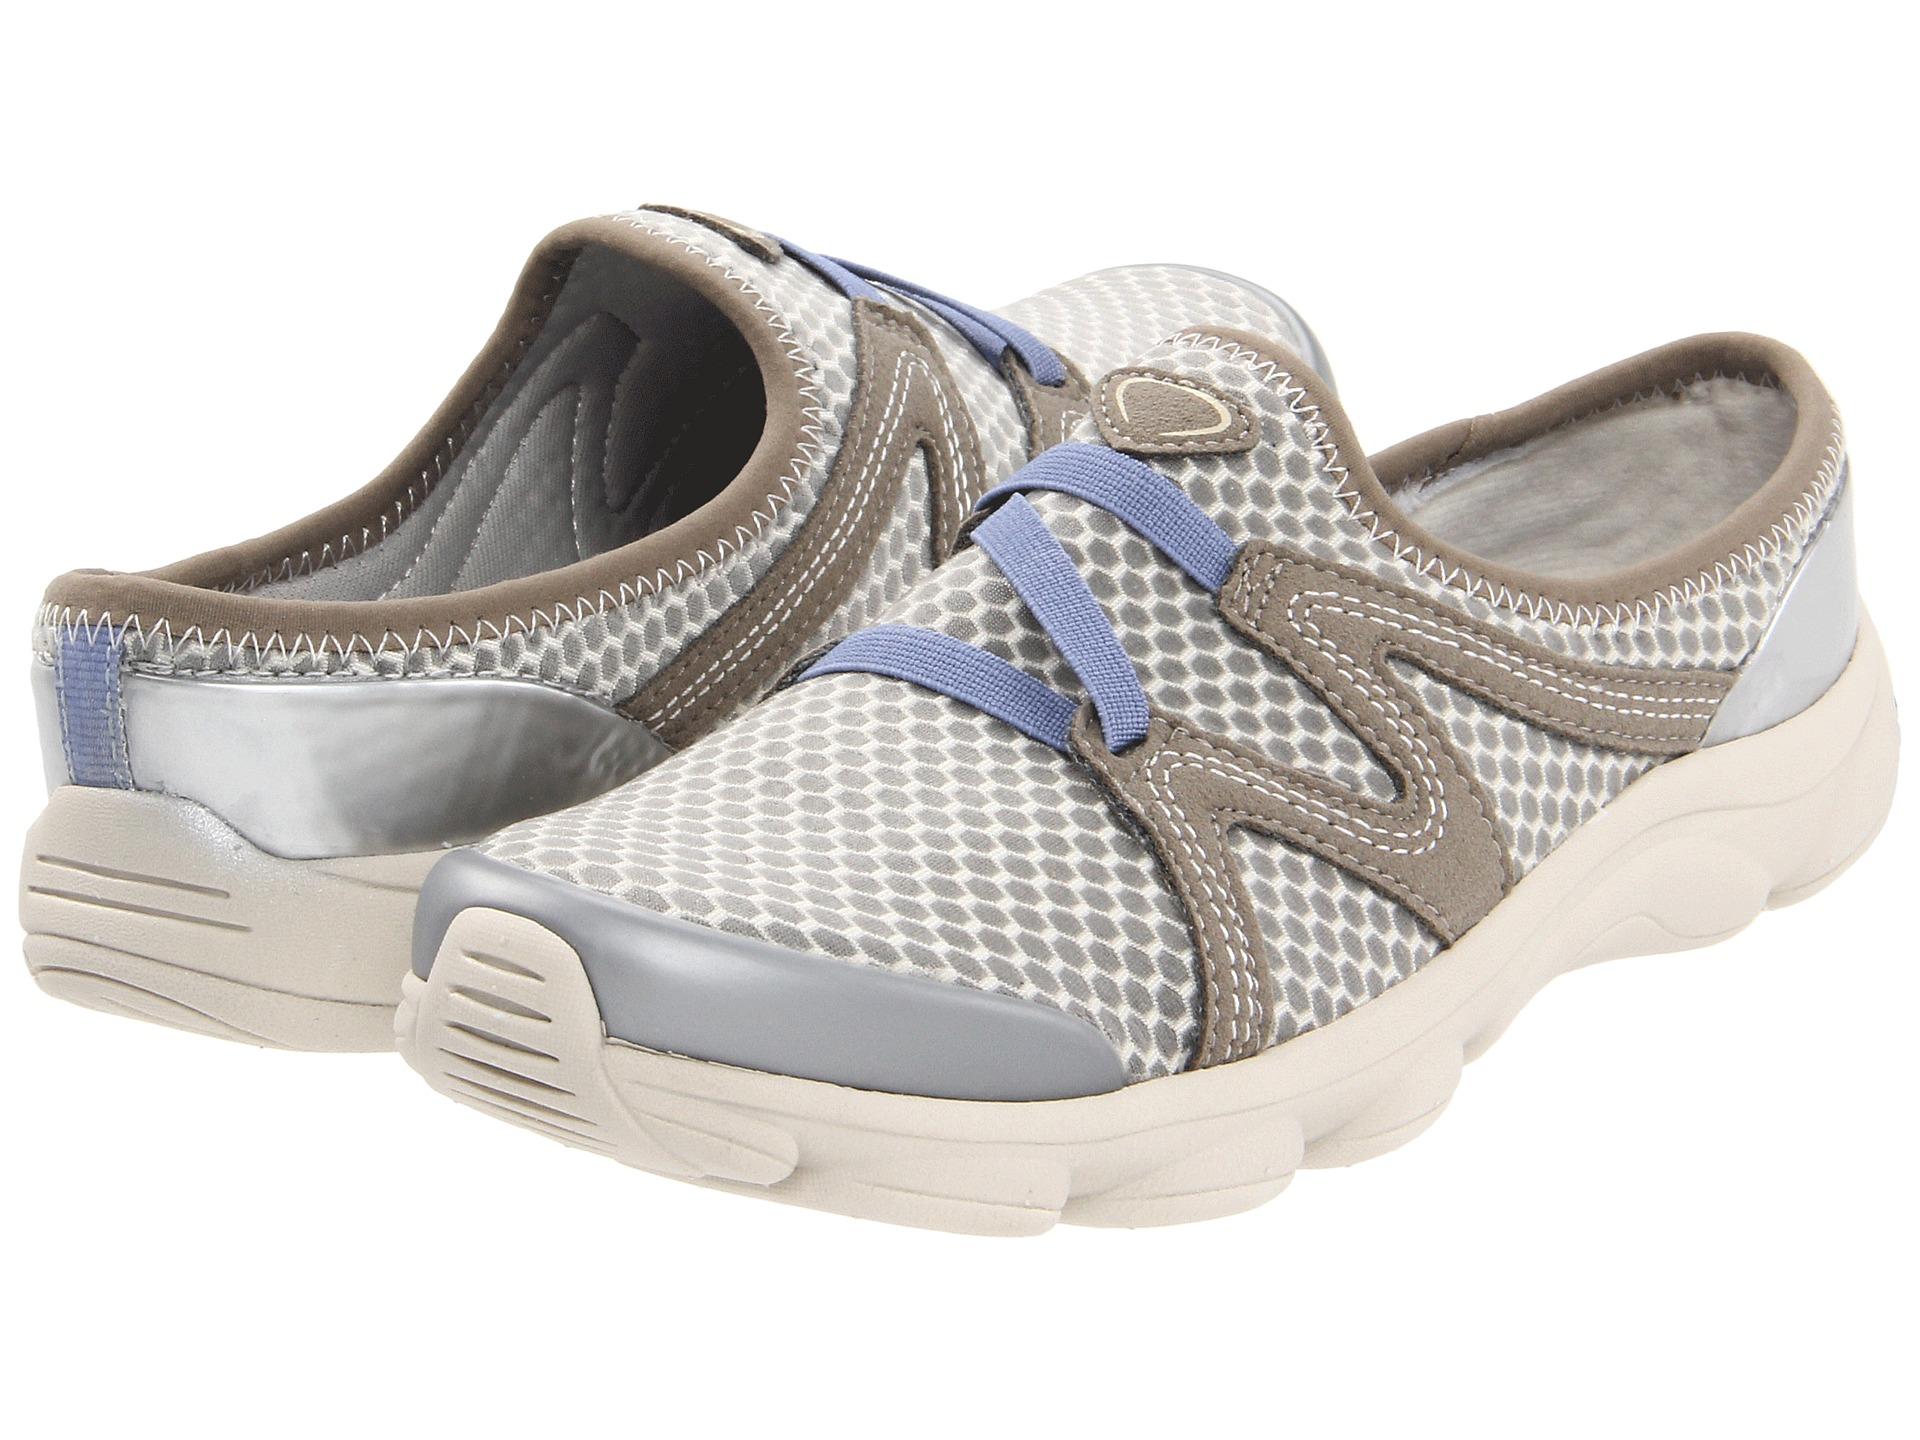 Riptide Shoes Easy Spirit Size